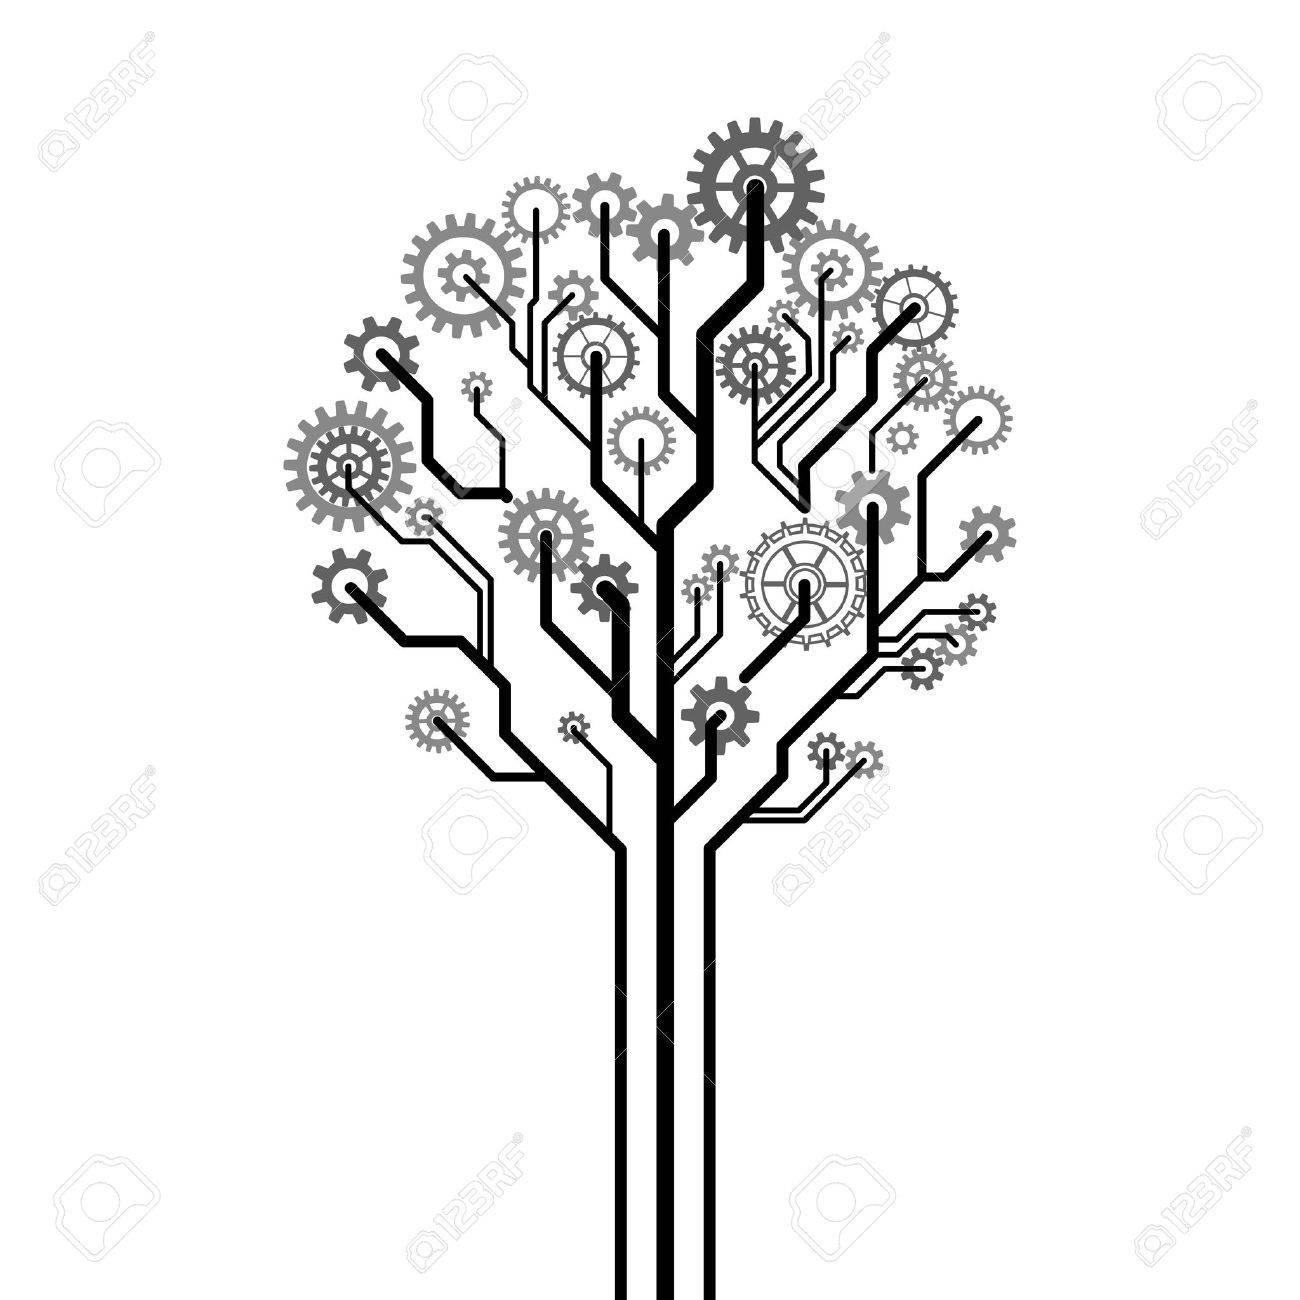 Tree made of gear wheels A vector illustration - 18412765